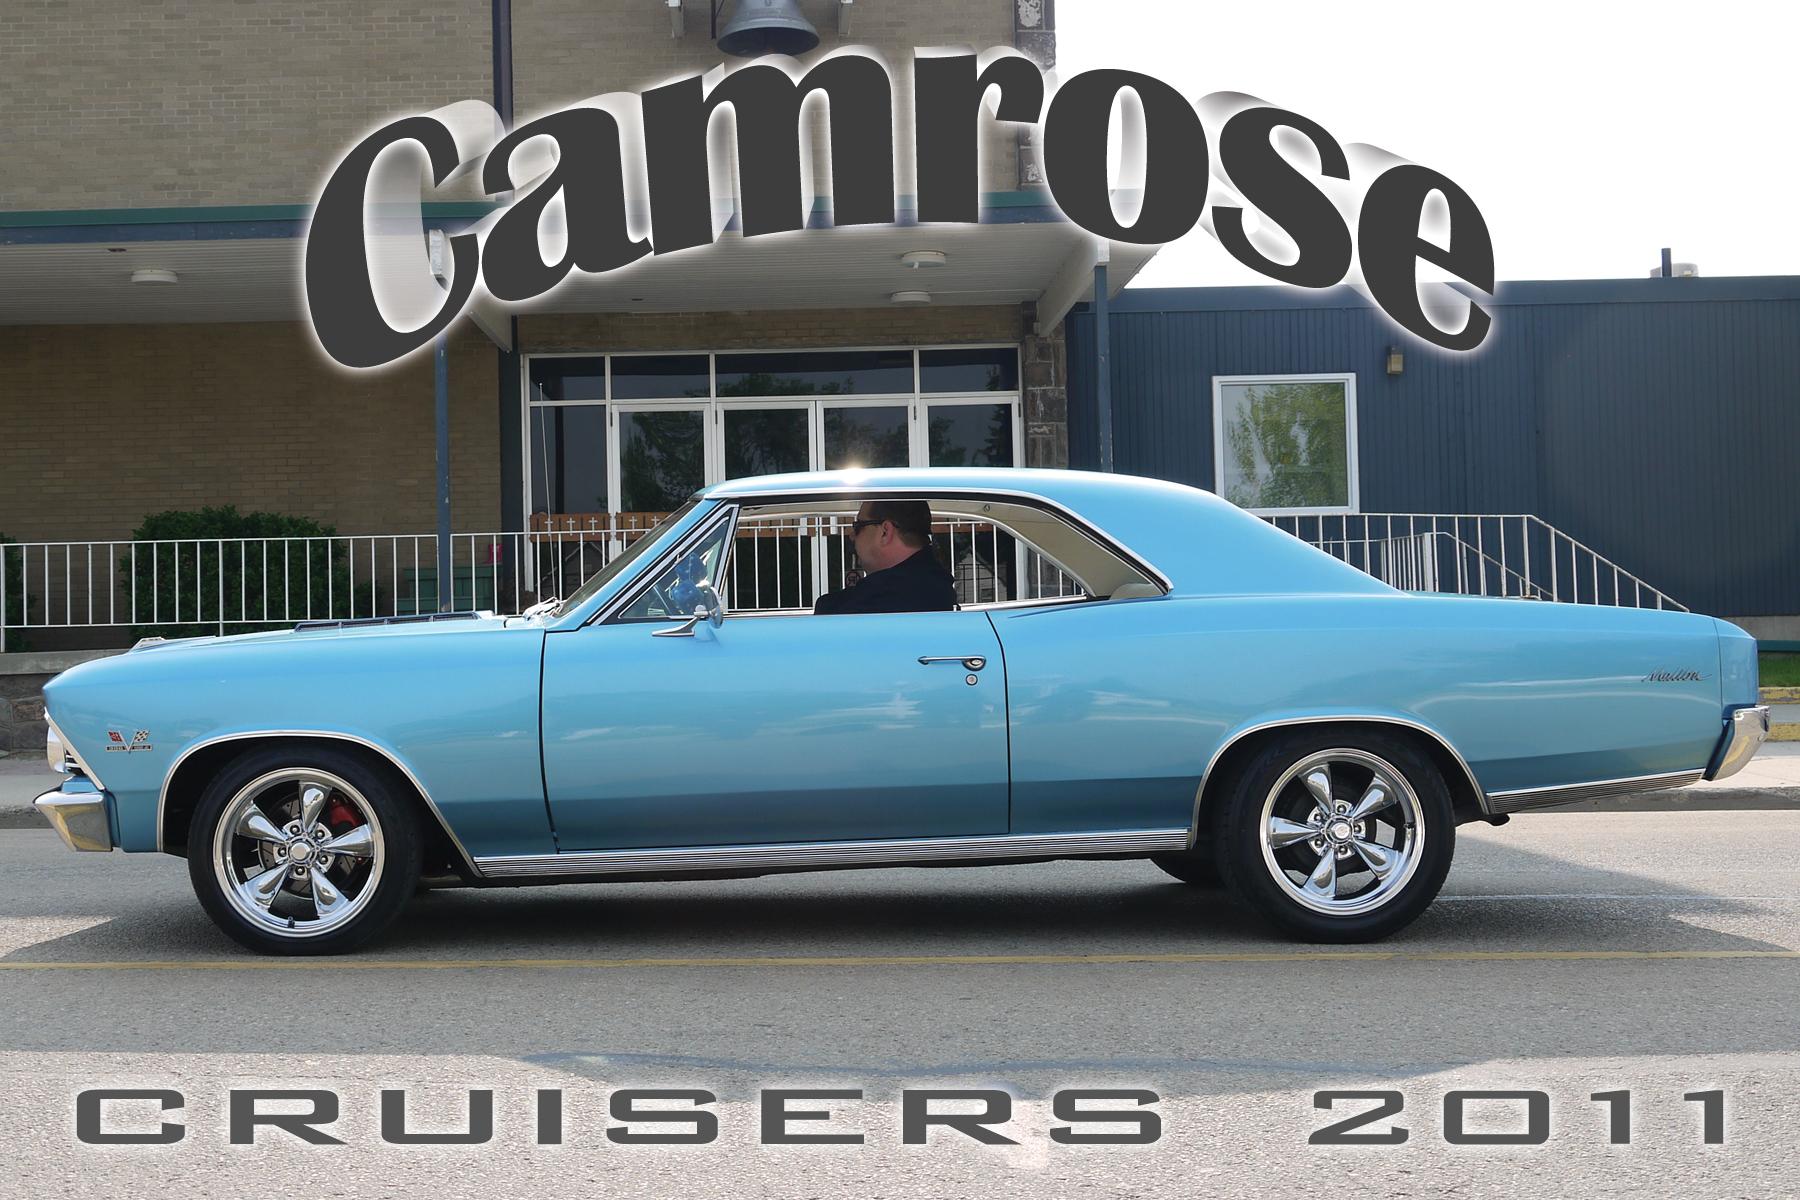 20110528_CamCruisers14.jpg